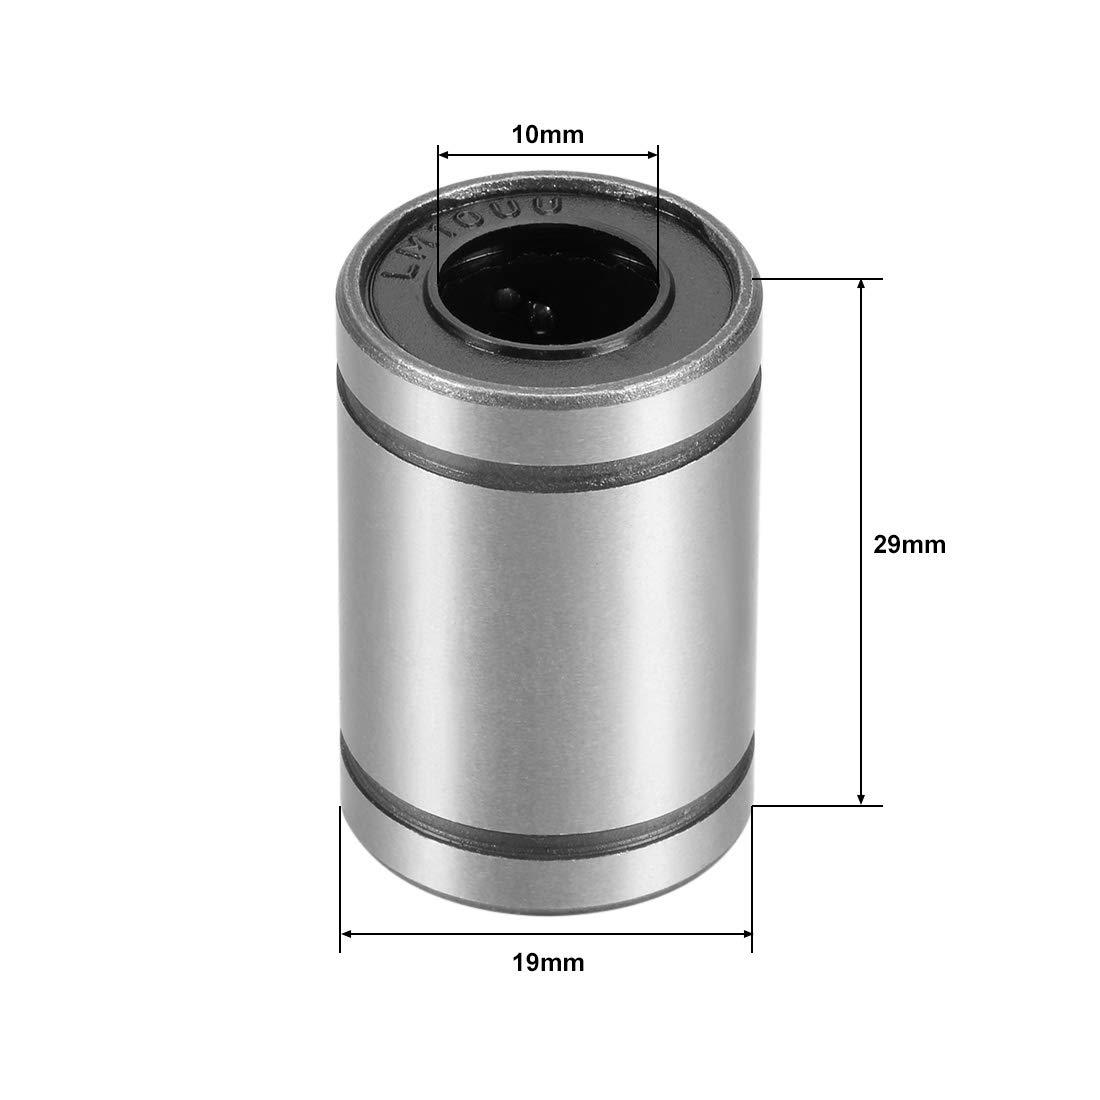 15 mm L/änge 3D-Drucker sourcing map LM5UU Linear-Kugellager 10 mm Au/ßendurchmesser 5 mm Bohrung f/ür CNC-Maschine 4 St/ück